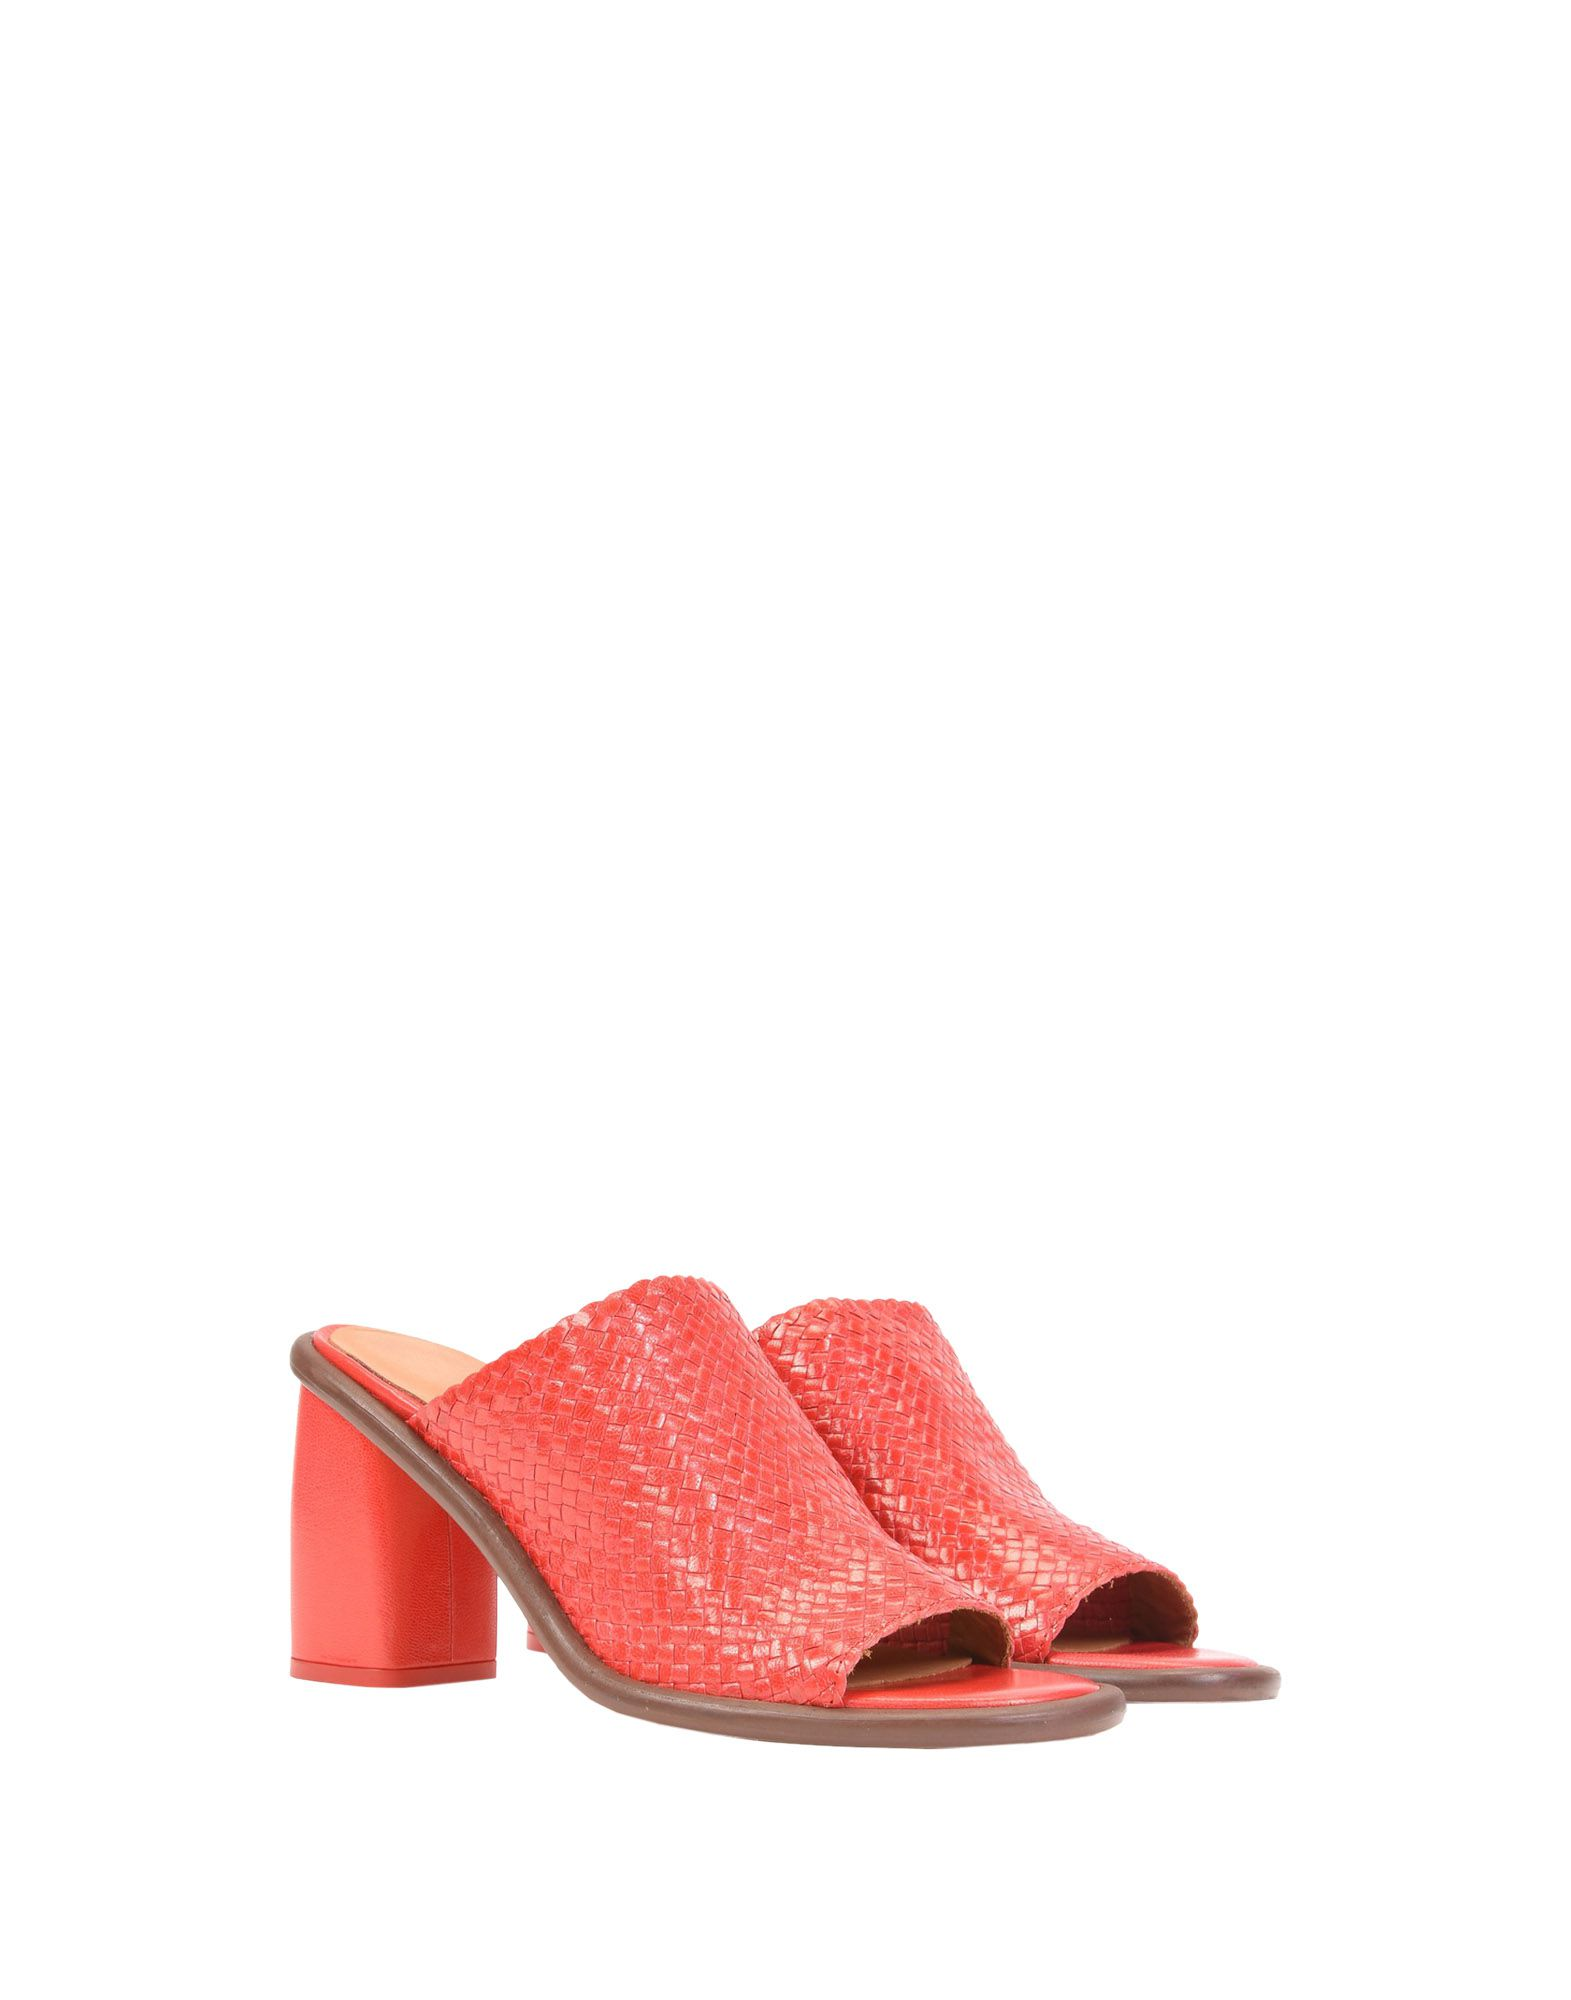 Miista Sandalen 11505144XF Damen  11505144XF Sandalen Heiße Schuhe 83cfa7